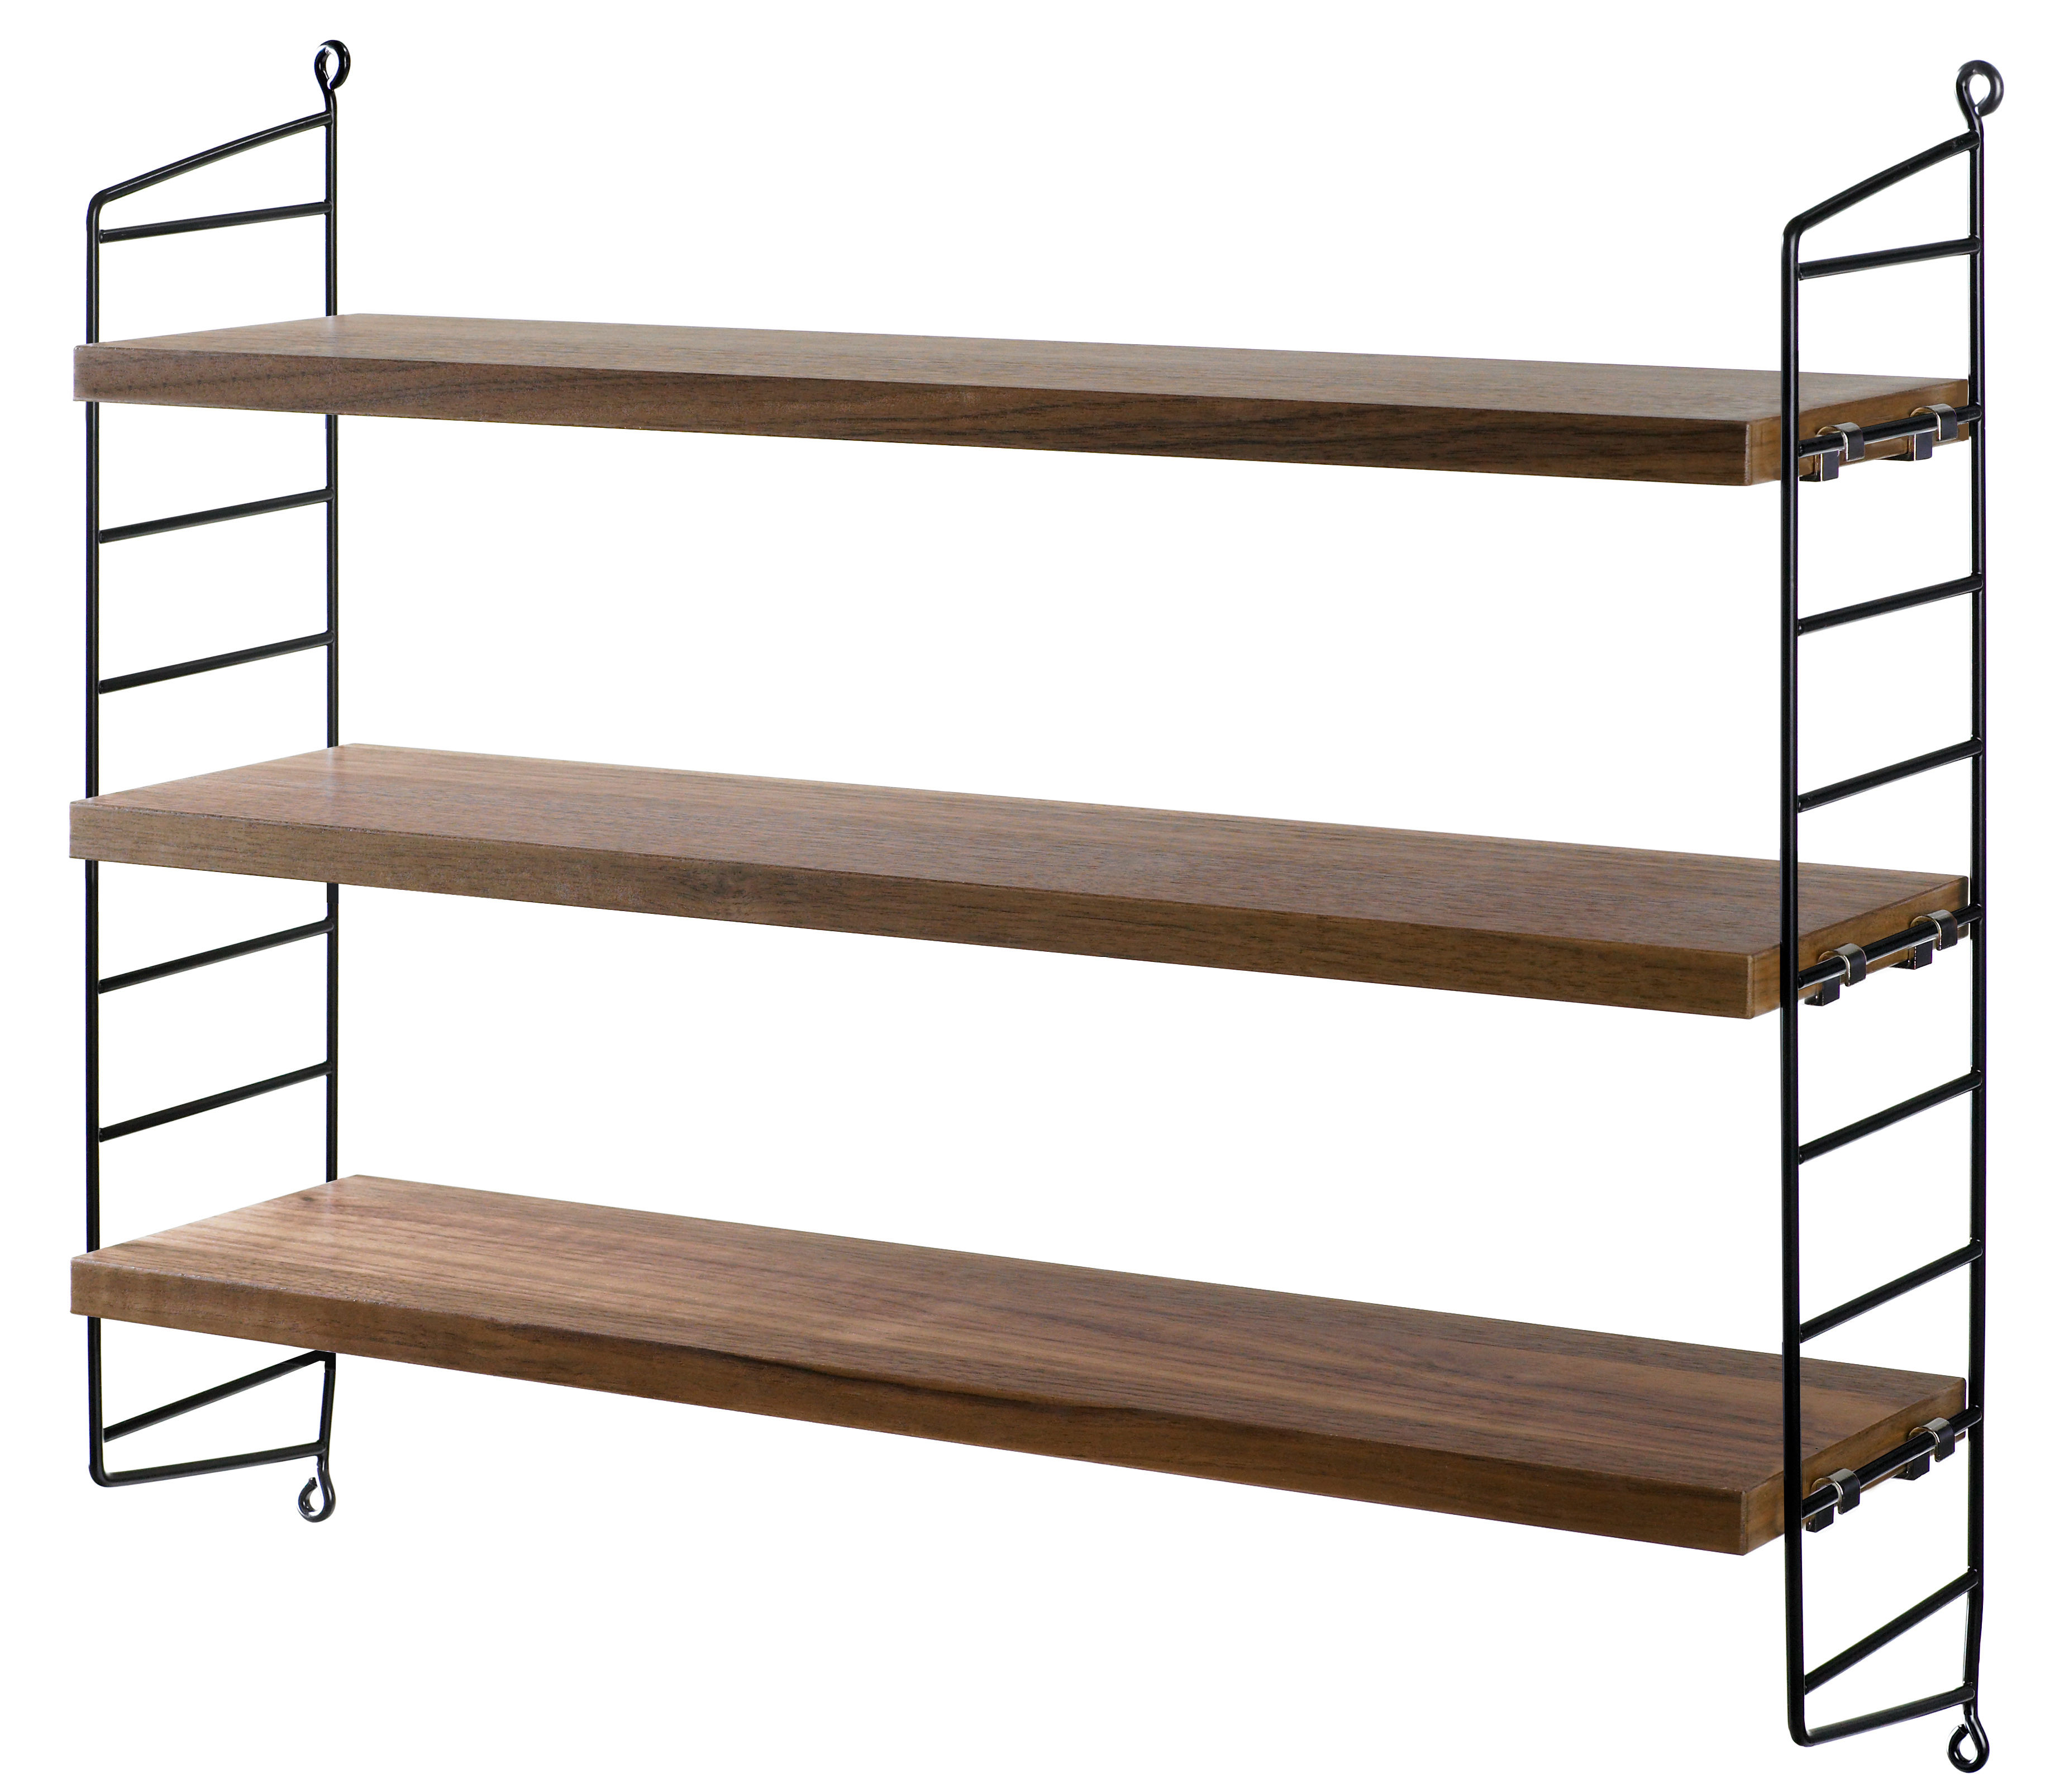 Furniture - Bookcases & Bookshelves - String Pocket Shelf - / Wooden version - L 60 x H 50 cm by String Furniture - Walnut / Black uprights - Lacquered steel, Walnut plywood